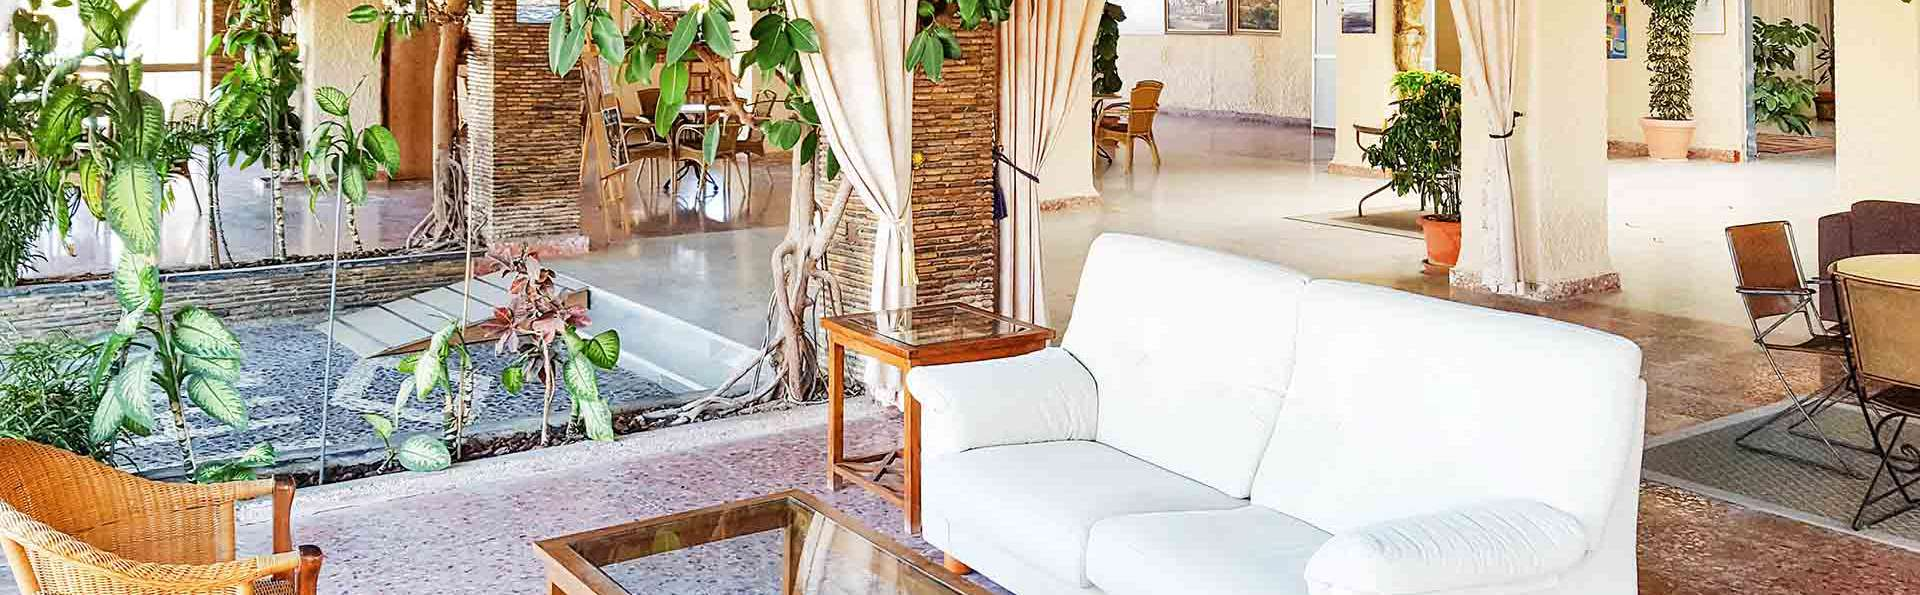 Hotel Bahía - EDIT_salon_01.jpg